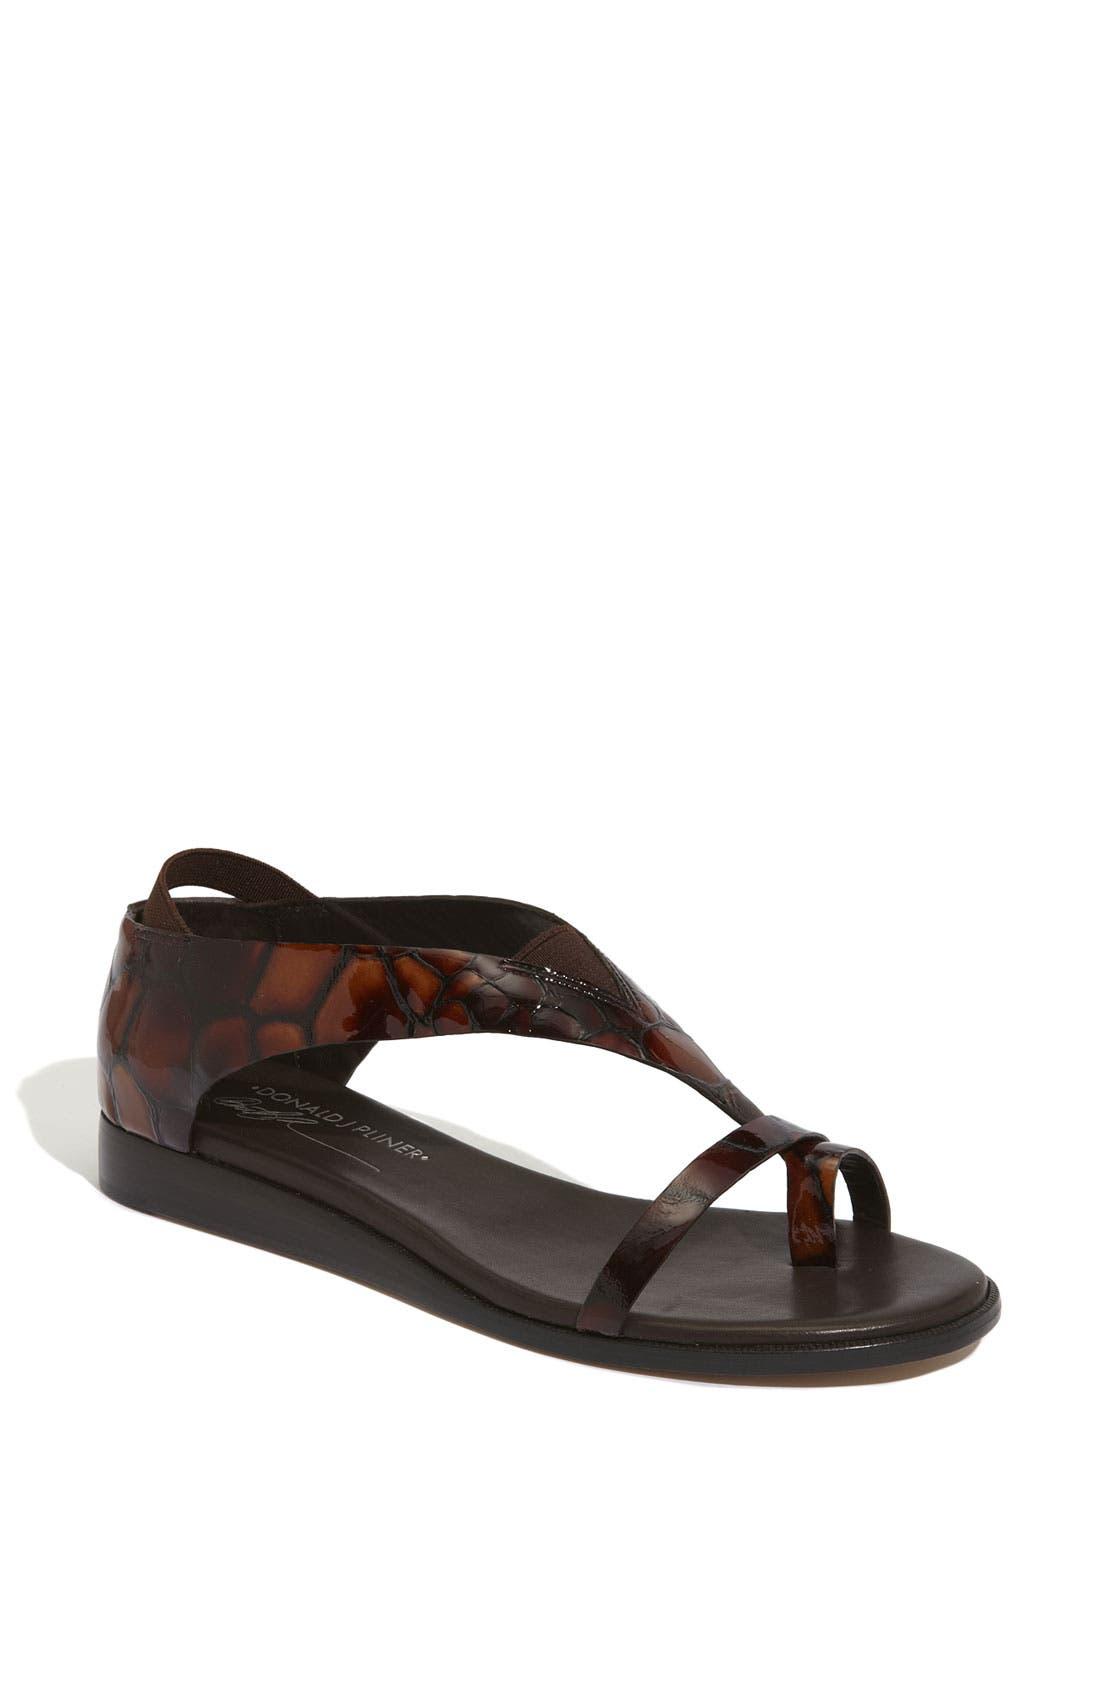 Alternate Image 1 Selected - Donald J Pliner 'Dorcas' Sandal